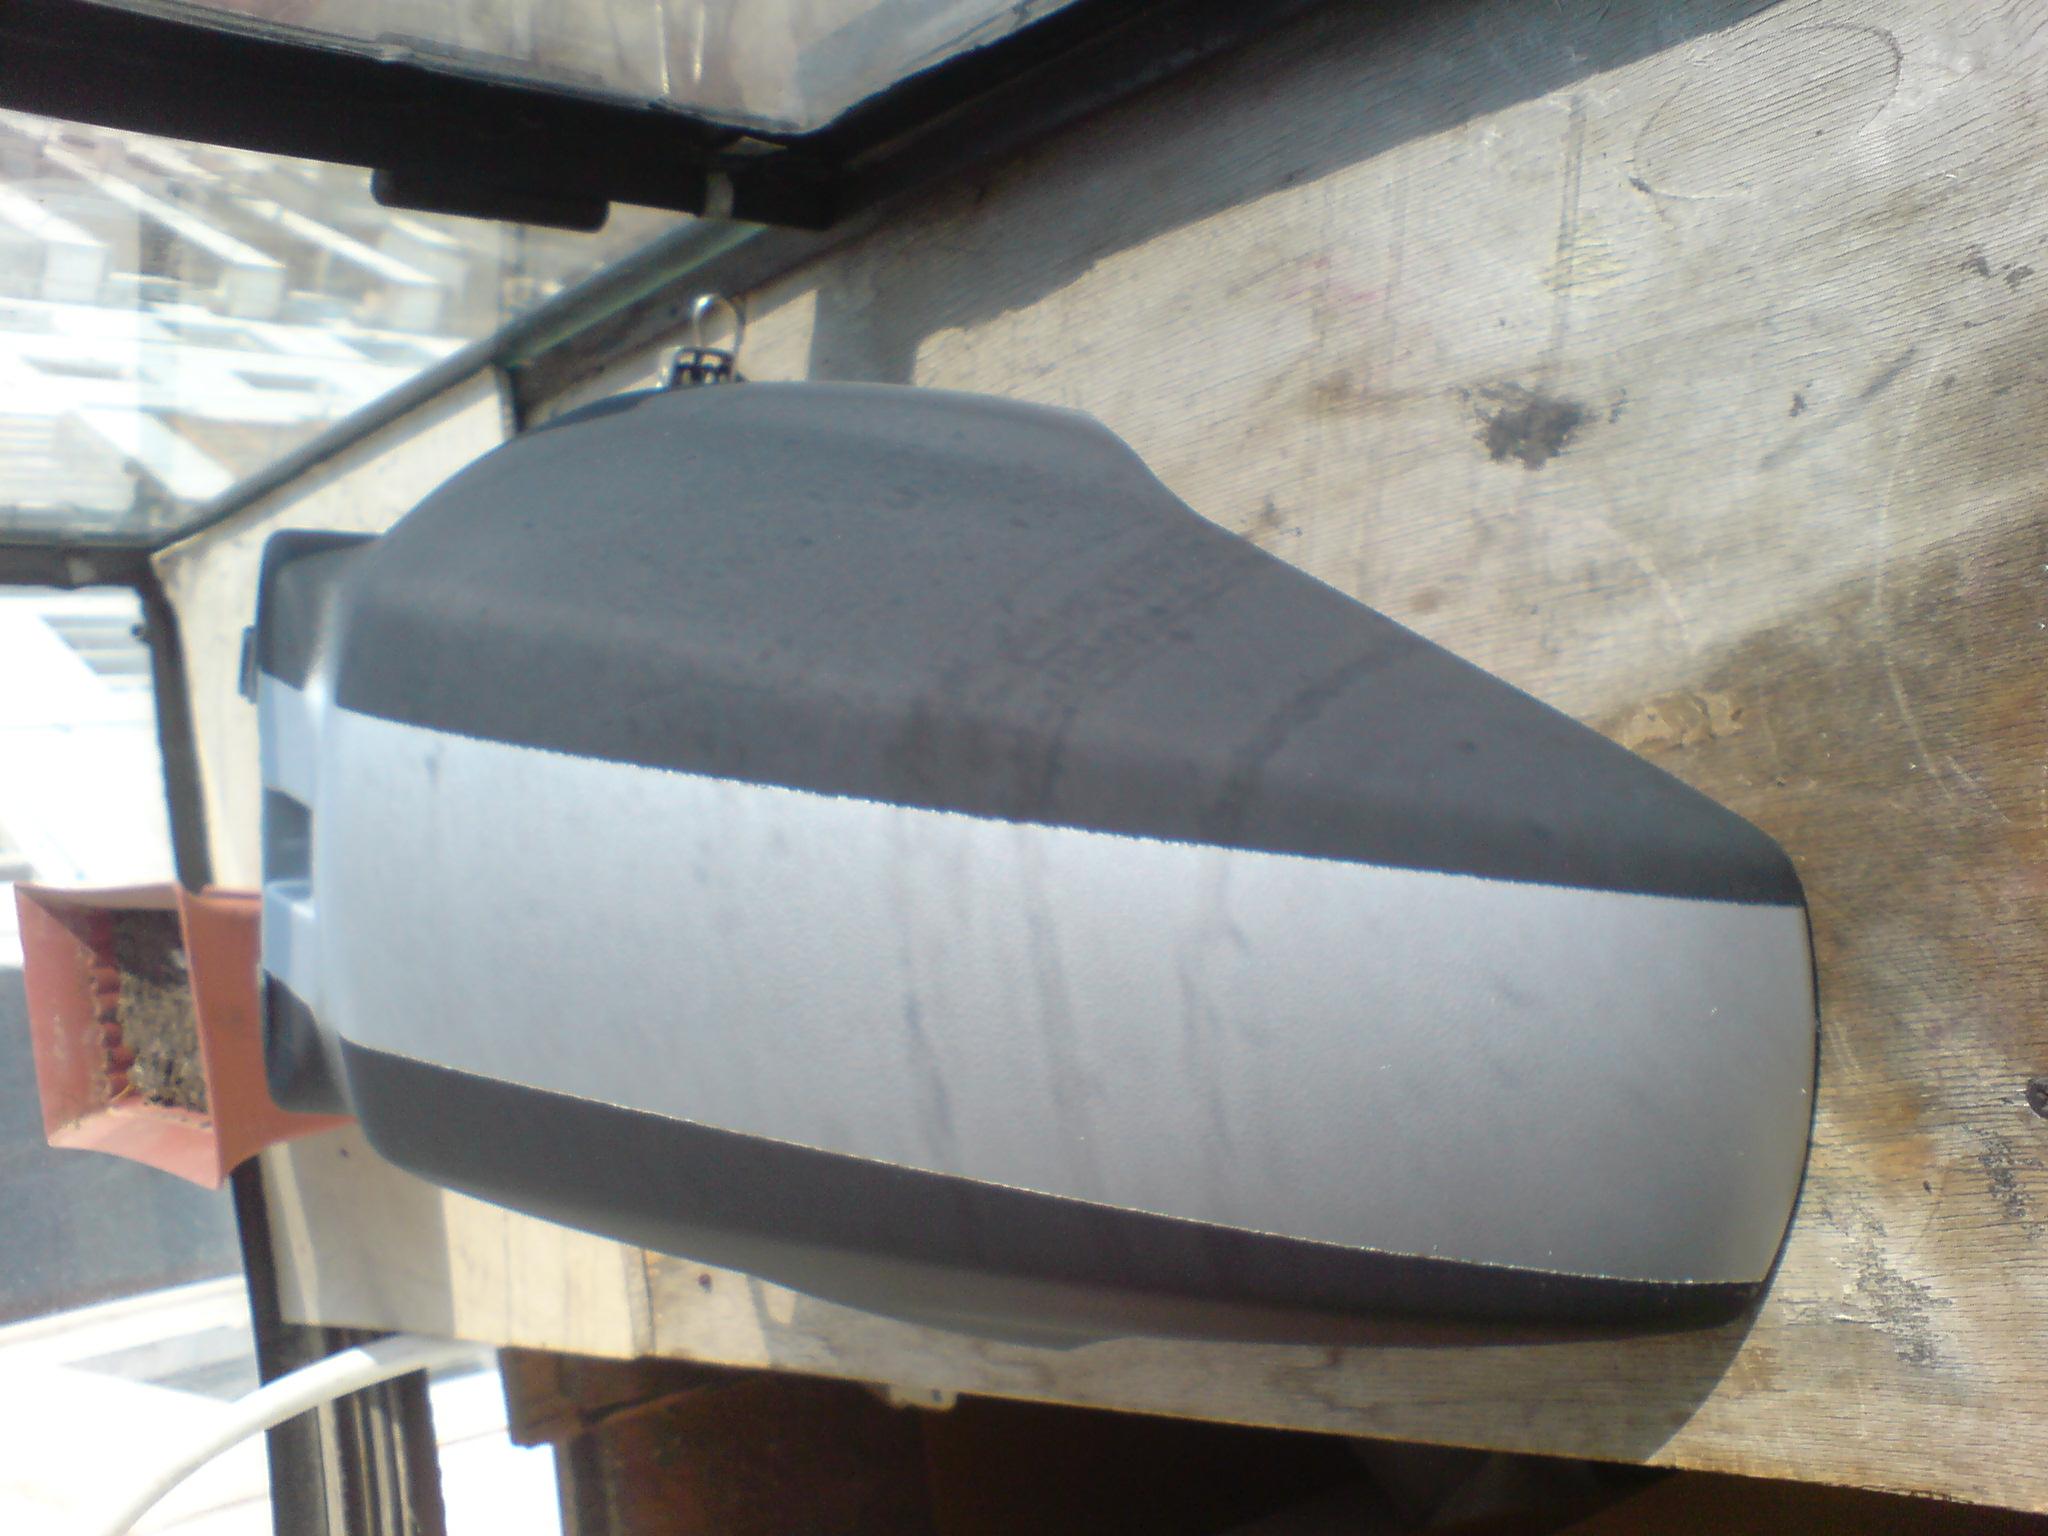 DSC00638.JPG